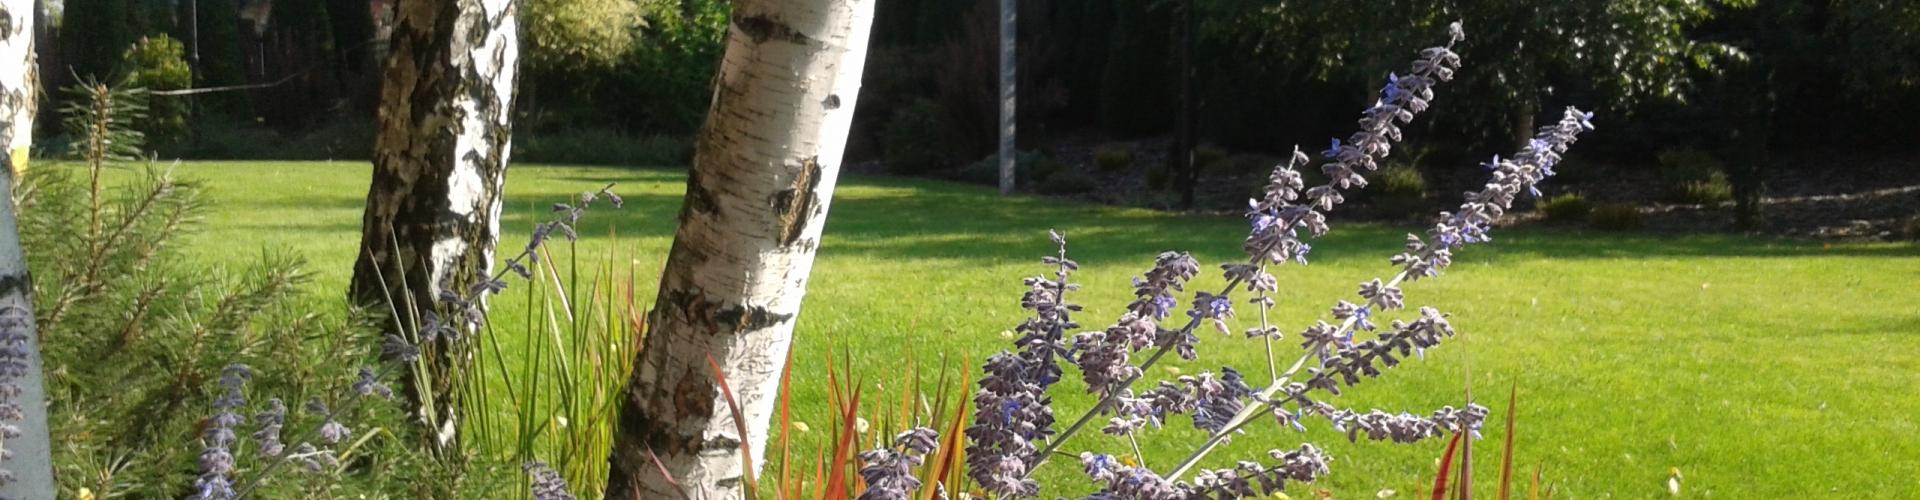 Dom otulony ogrodem